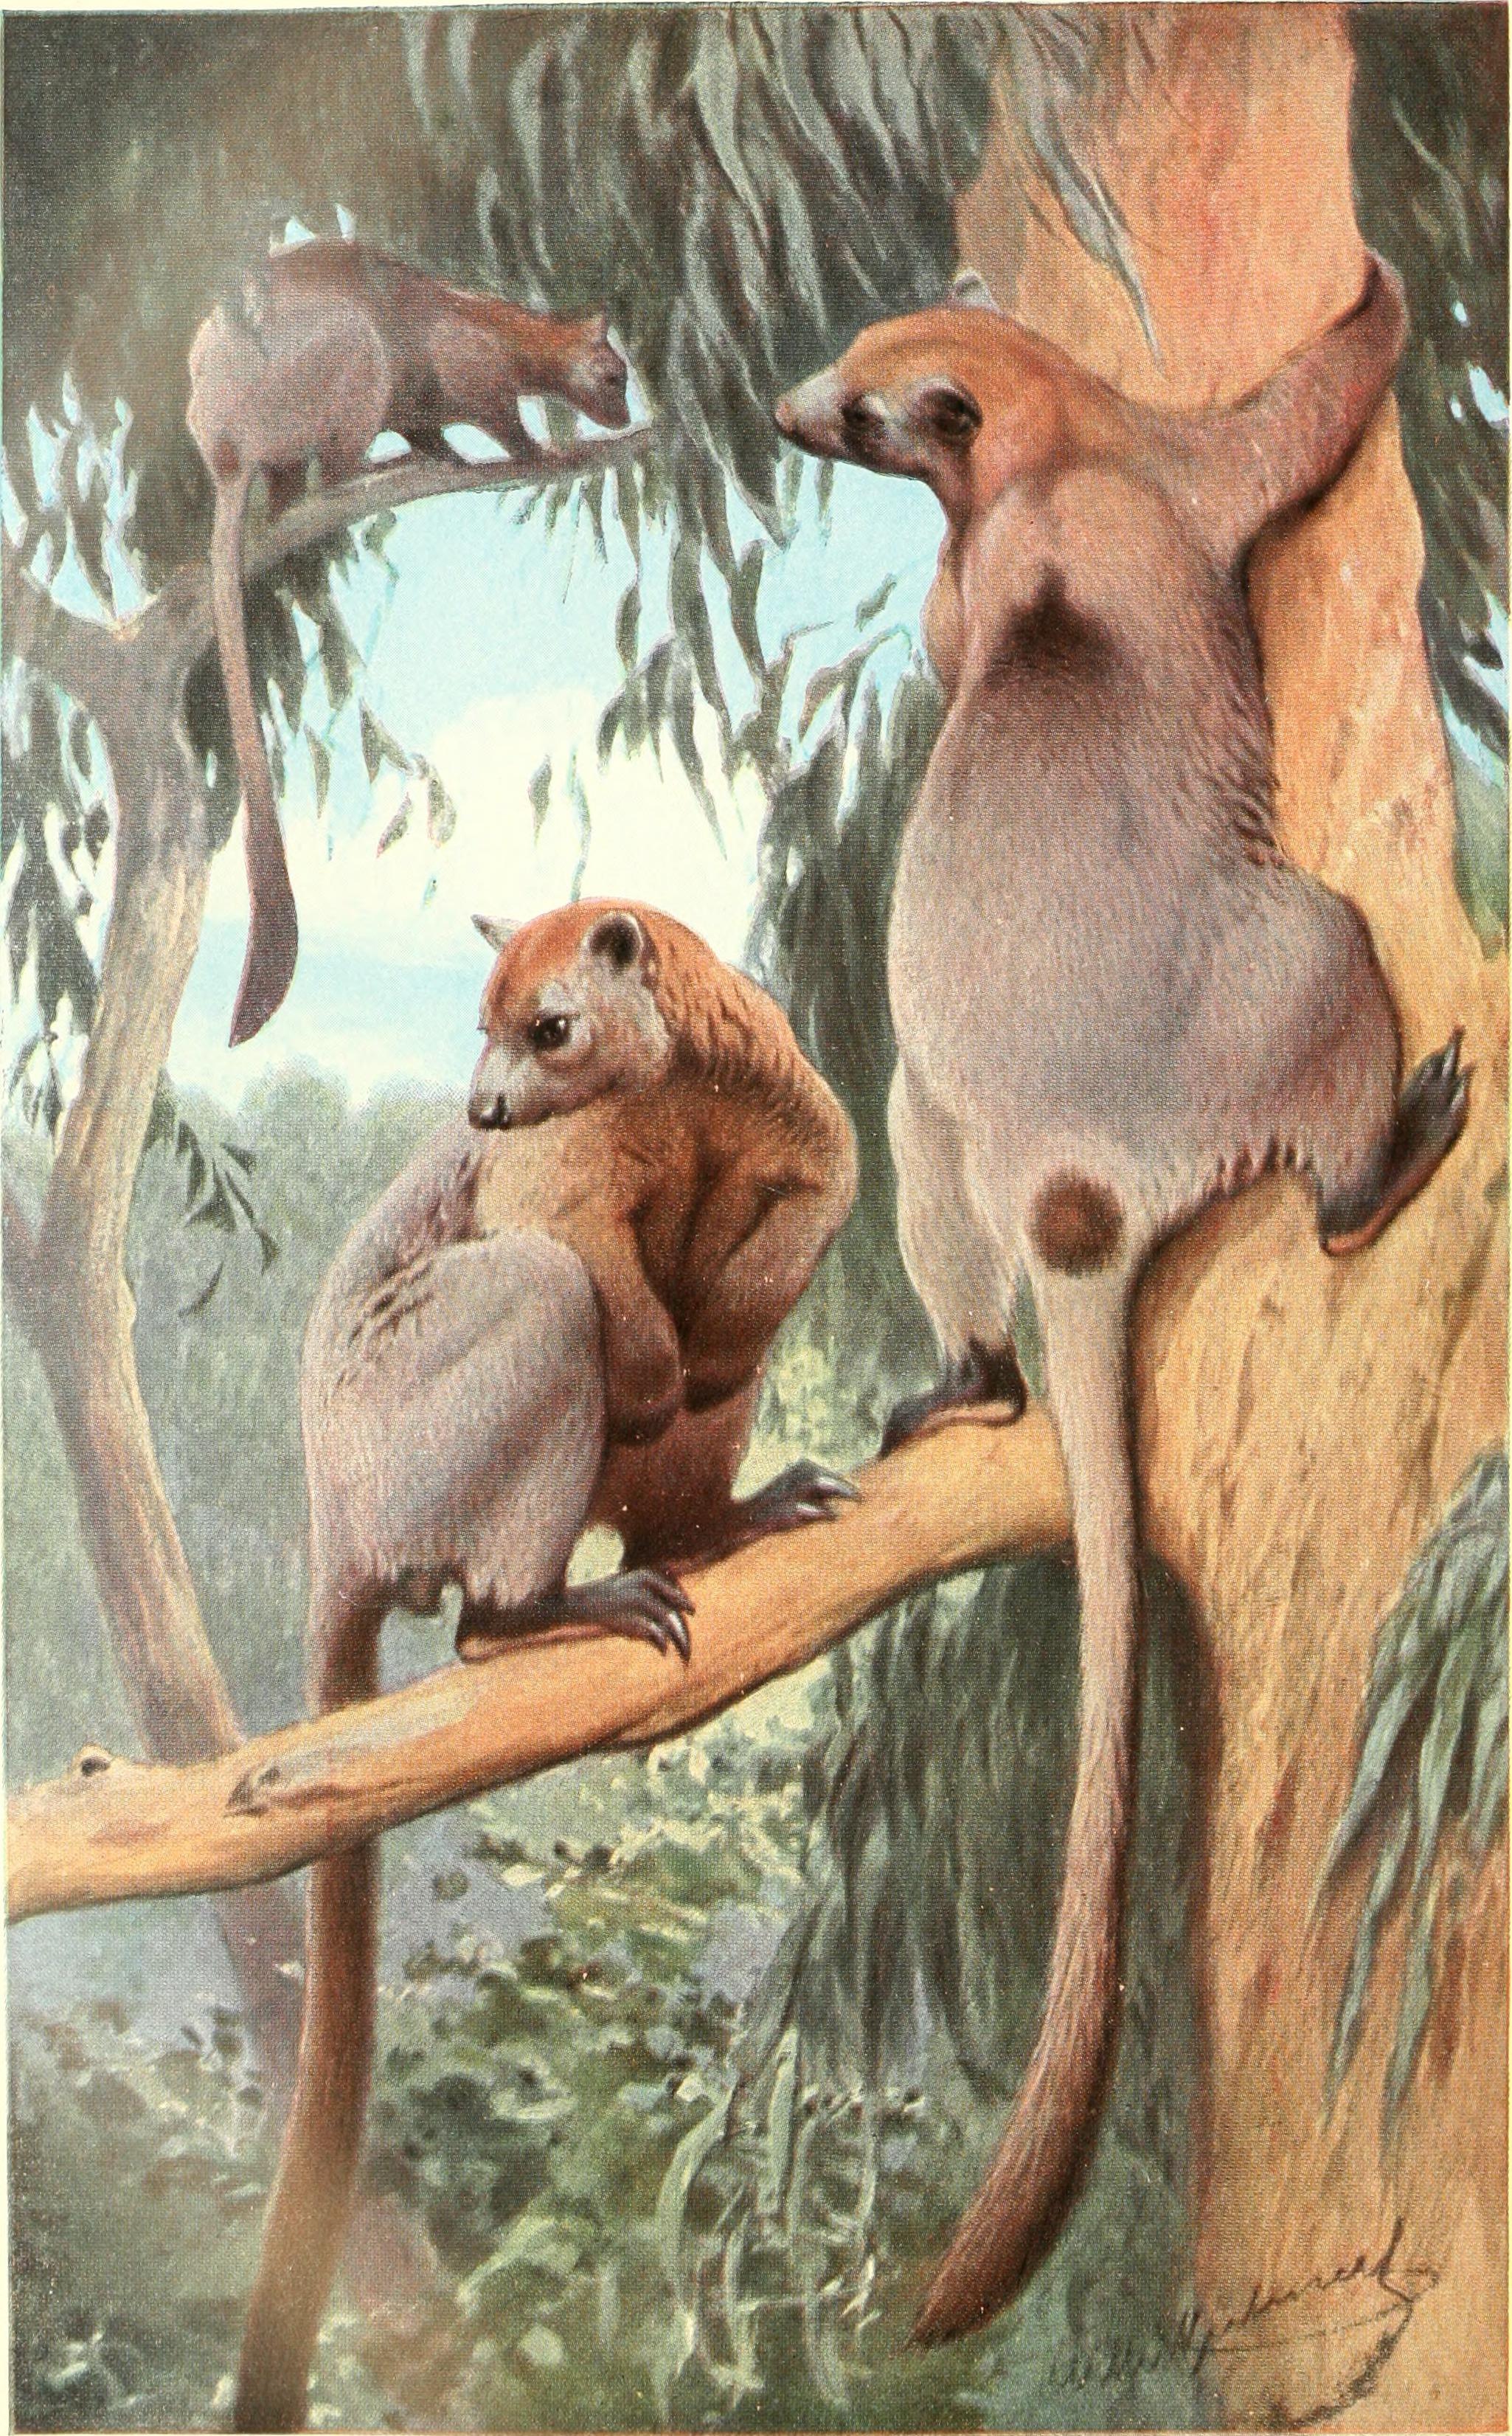 Image of Bennett's tree kangaroo